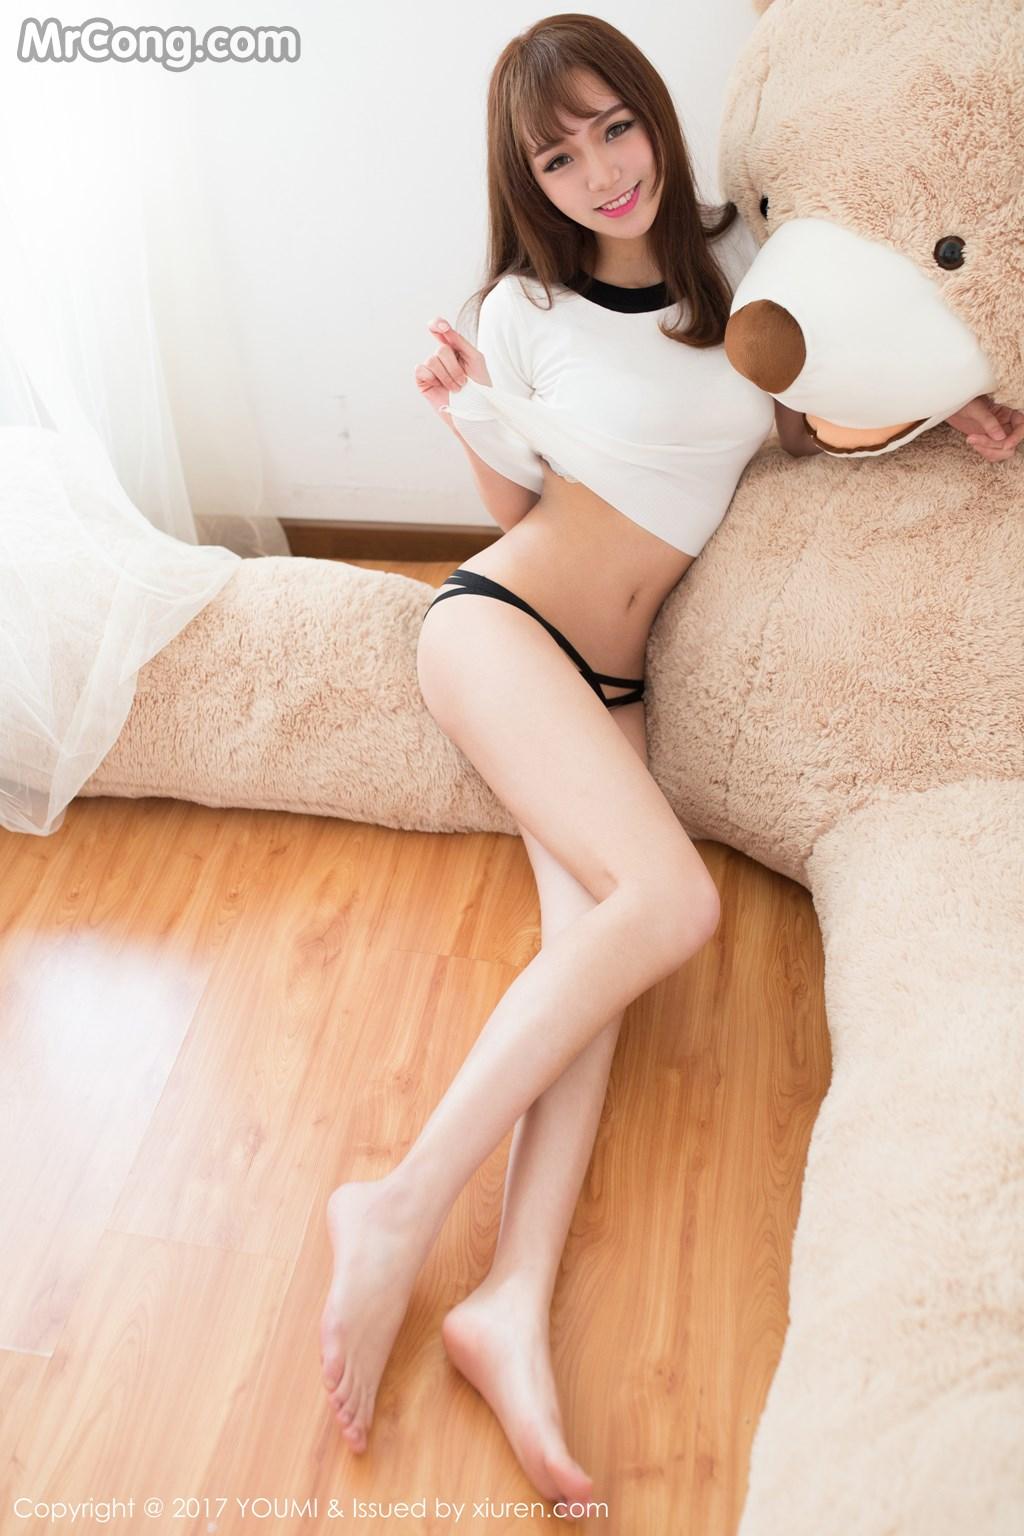 Image YouMi-Vol.014-Bu-Ning-Bling-MrCong.com-002 in post YouMi Vol.014: Người mẫu Bu Ning Bling (不柠bling) (53 ảnh)